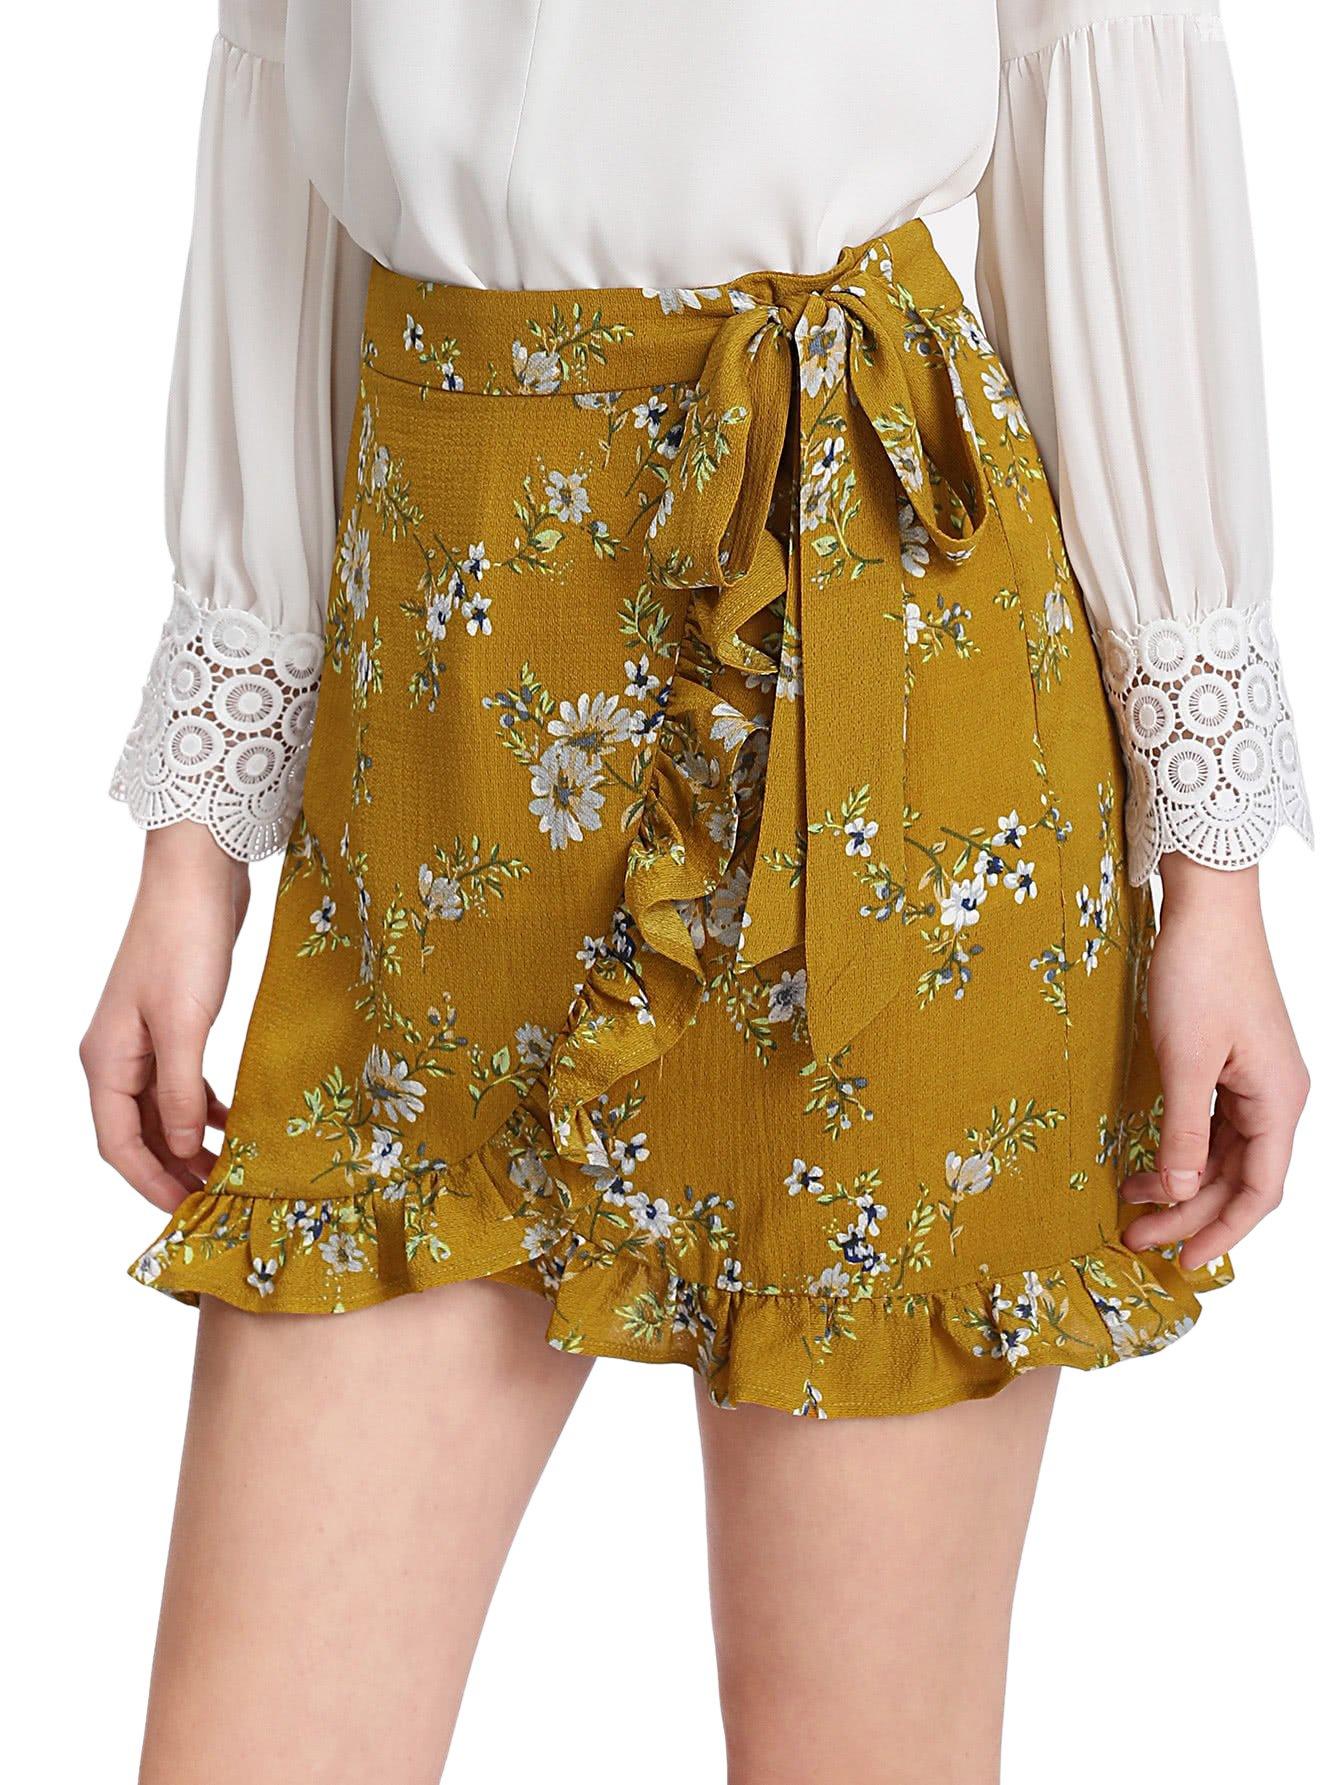 SweatyRocks Women's Boho Floral Print High Waist Ruffle Short Mini Wrap Skirts Yellow S